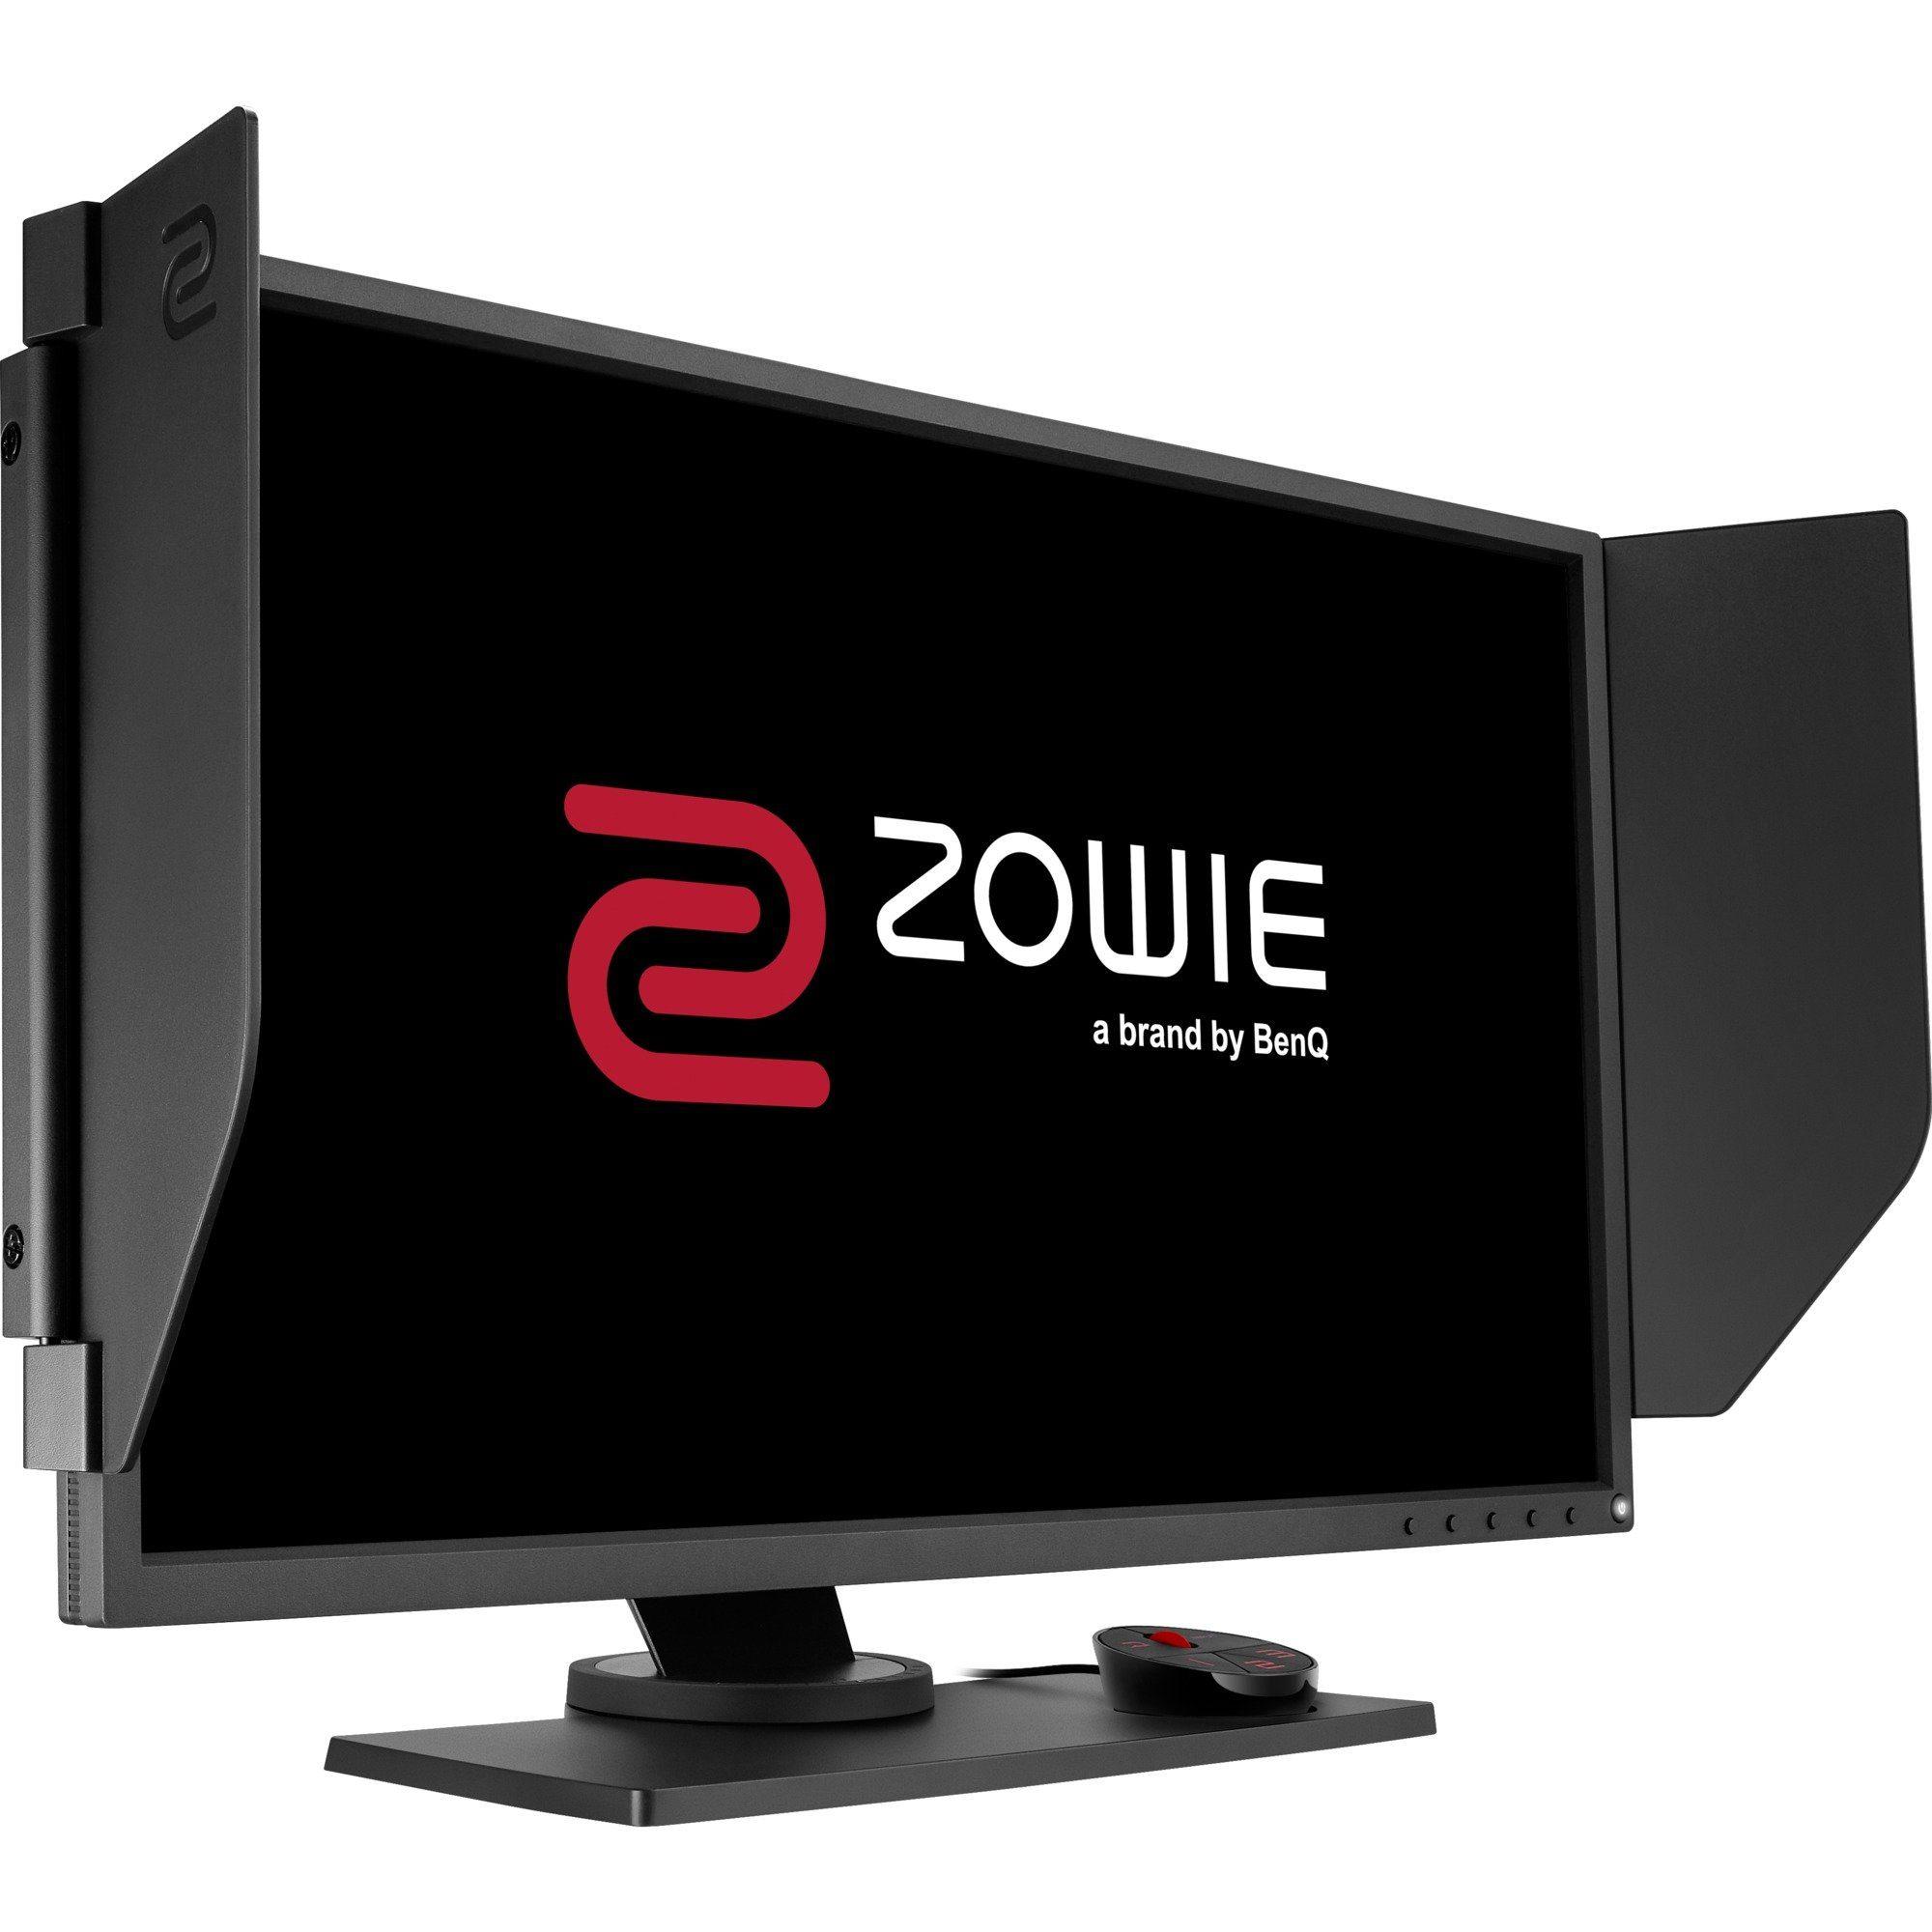 BenQ LED-Monitor »XL2536, HDMI, DVI-DL, Displayport«